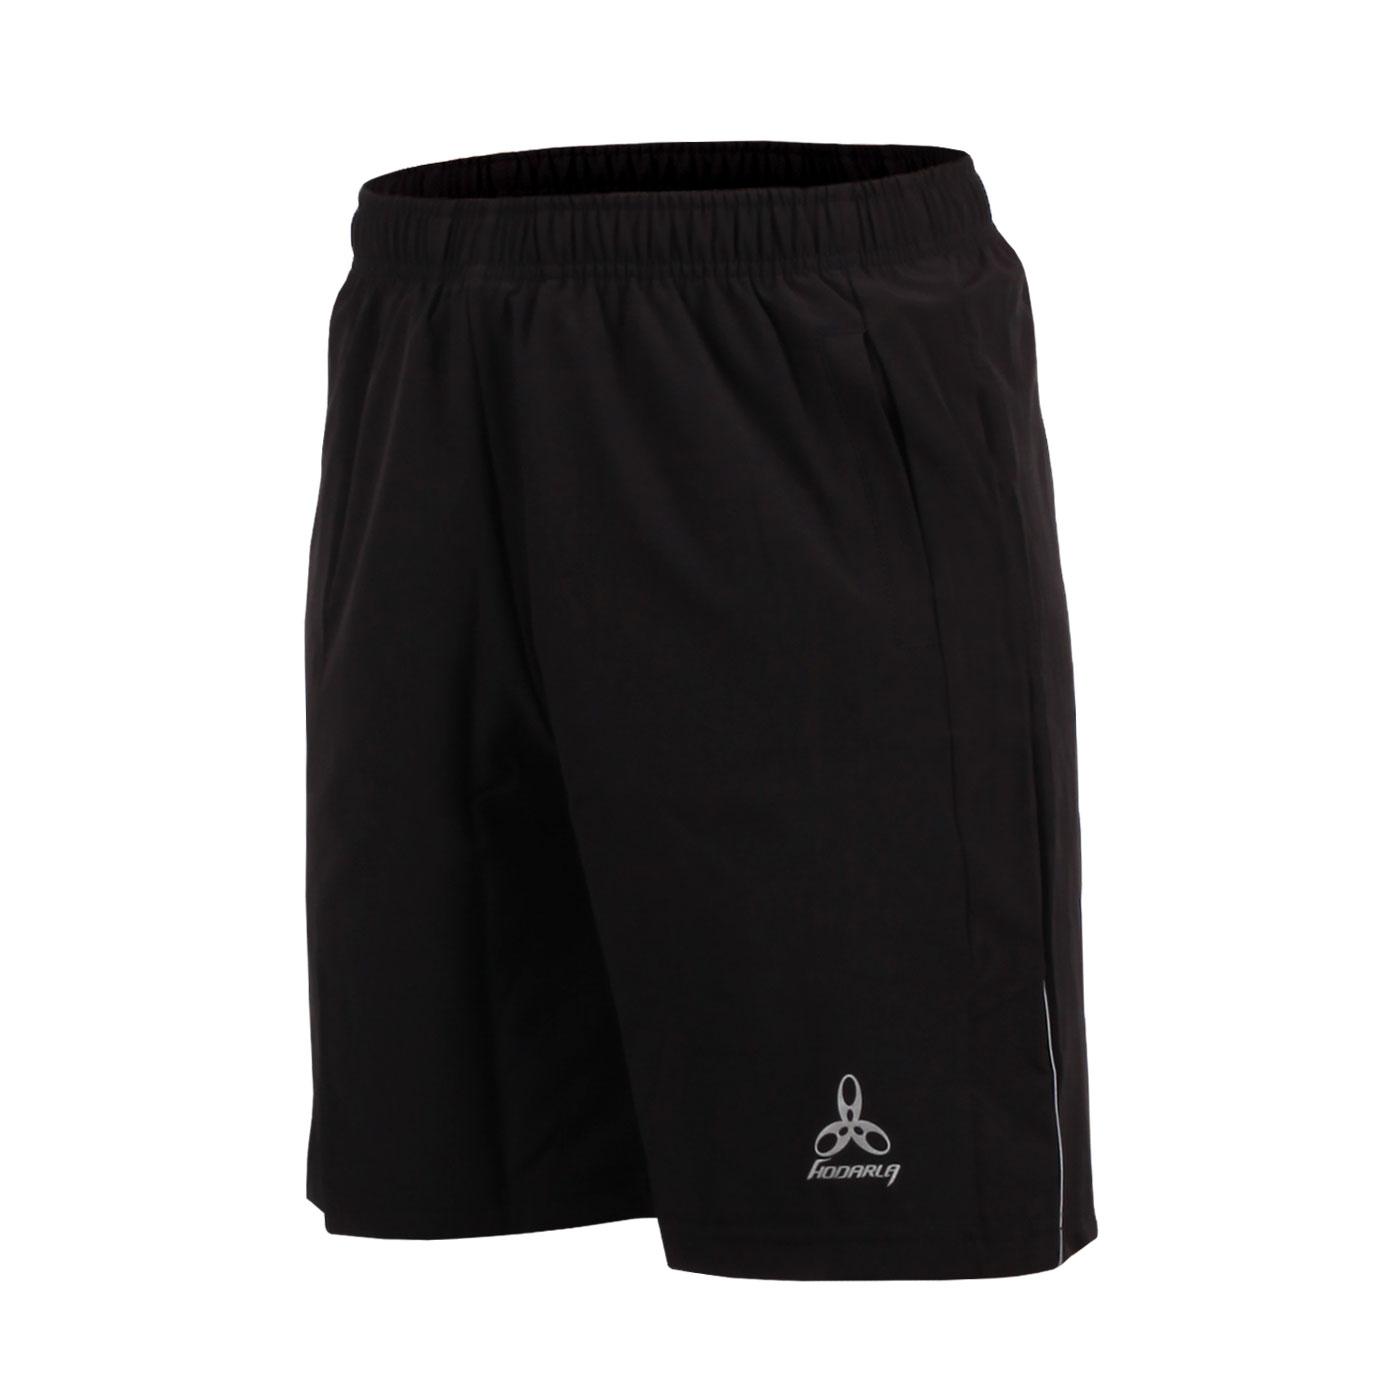 HODARLA 男-競技平織彈性短褲 3139001 - 黑